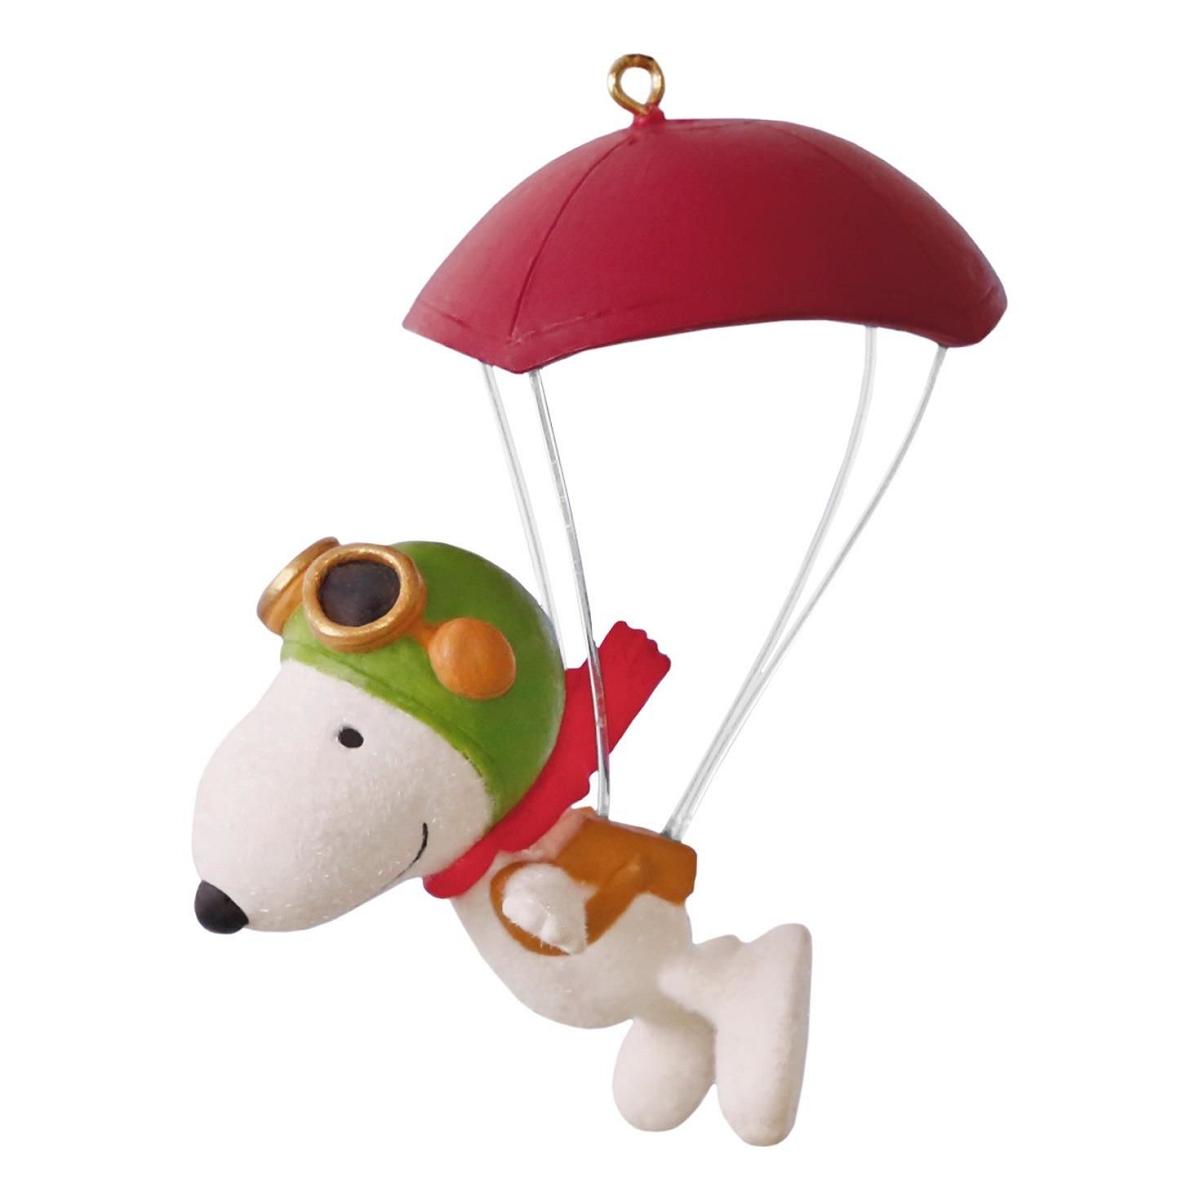 Snoopy Christmas Tree Topper: 2016 Paratrooper Snoopy Hallmark Keepsake Ornament